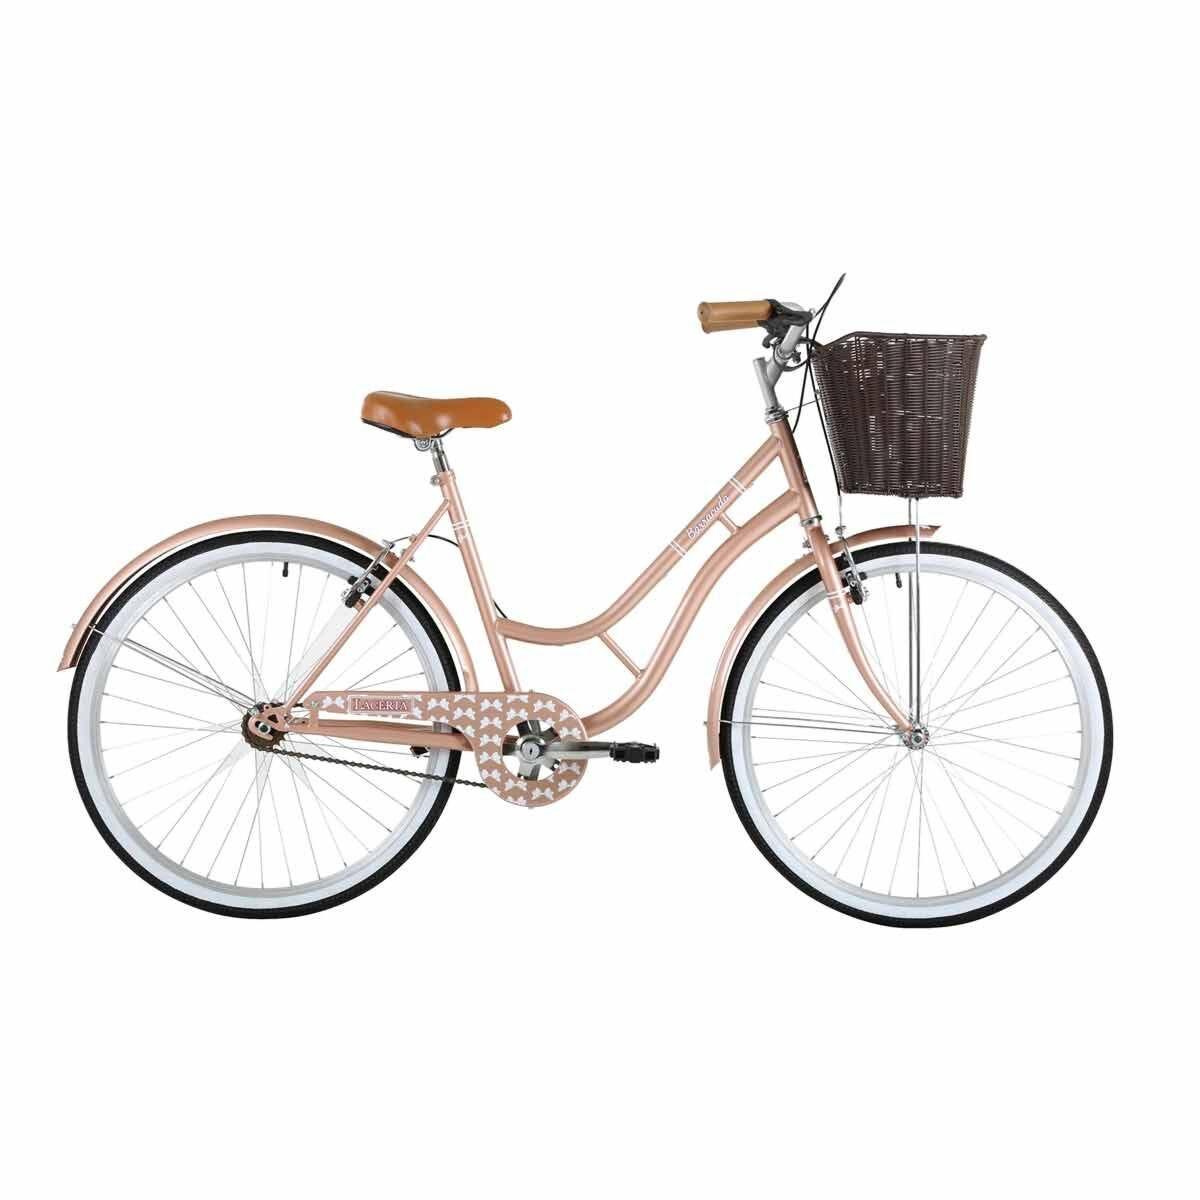 Barracuda Lacerta Heritage Ladies City Bike 19 Inch Frame